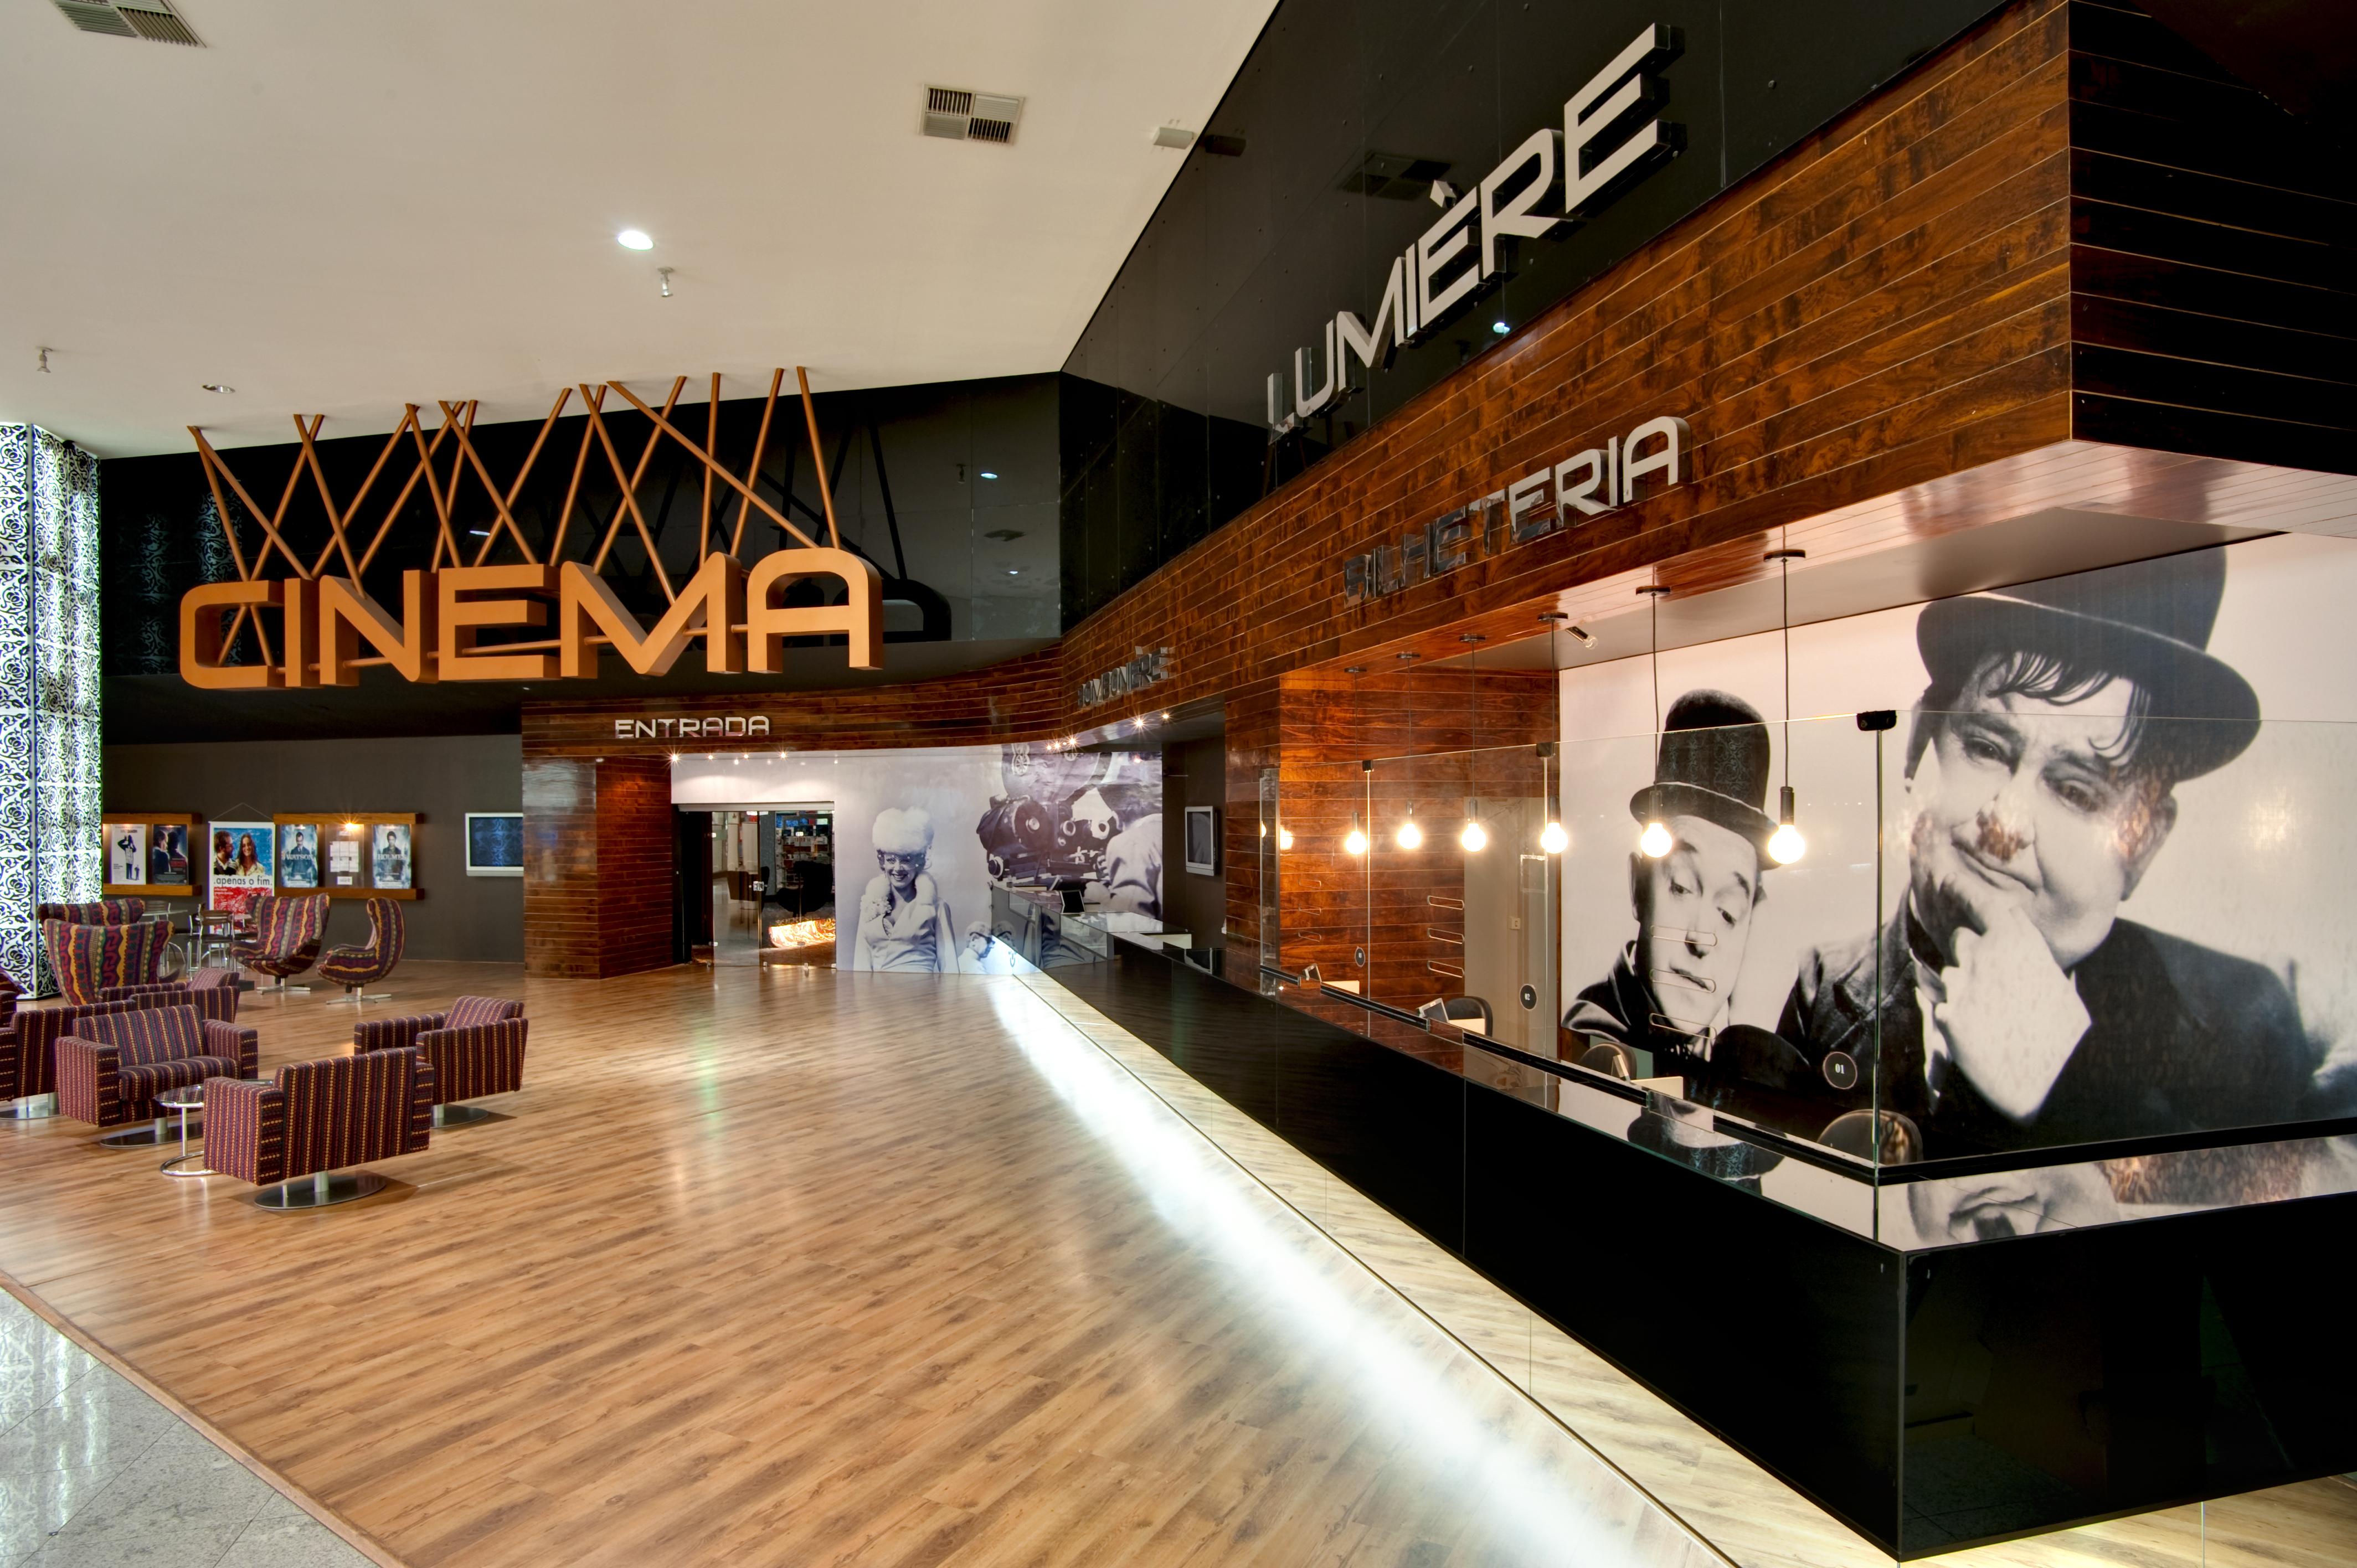 cinema lumiere bougainville dayala rafael arquitetura. Black Bedroom Furniture Sets. Home Design Ideas